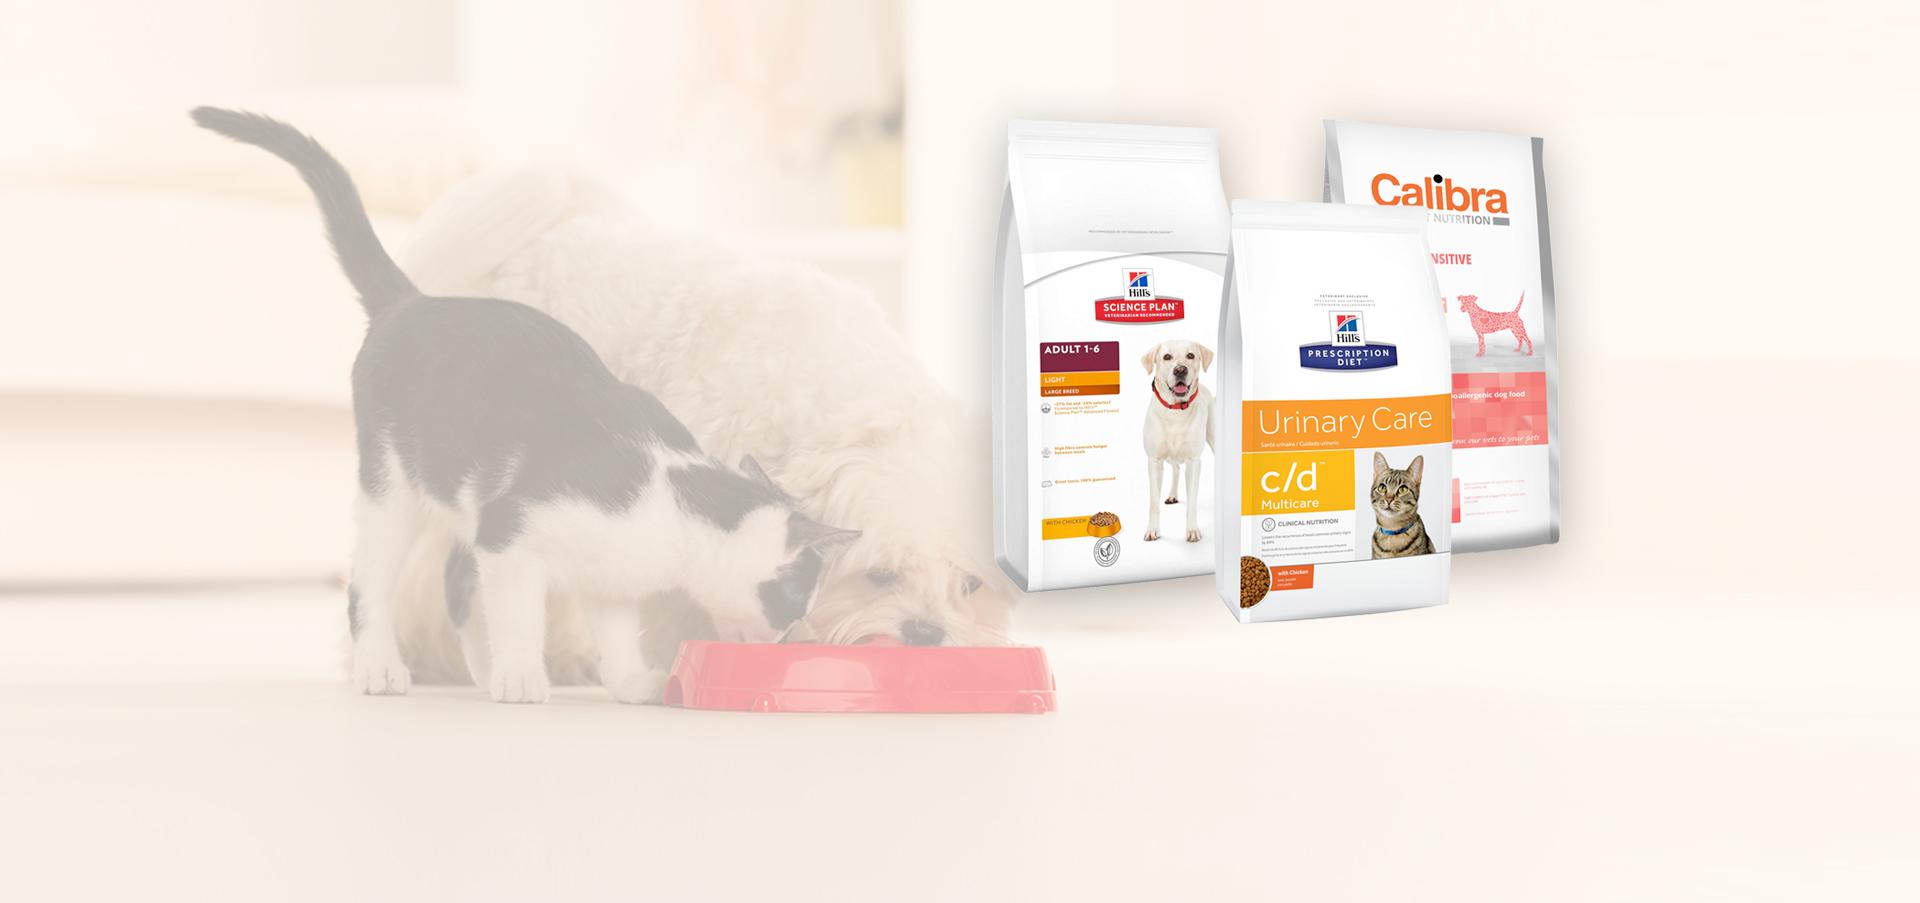 Bushypark Vets Galway stock Hills & Calibra dog and cat food